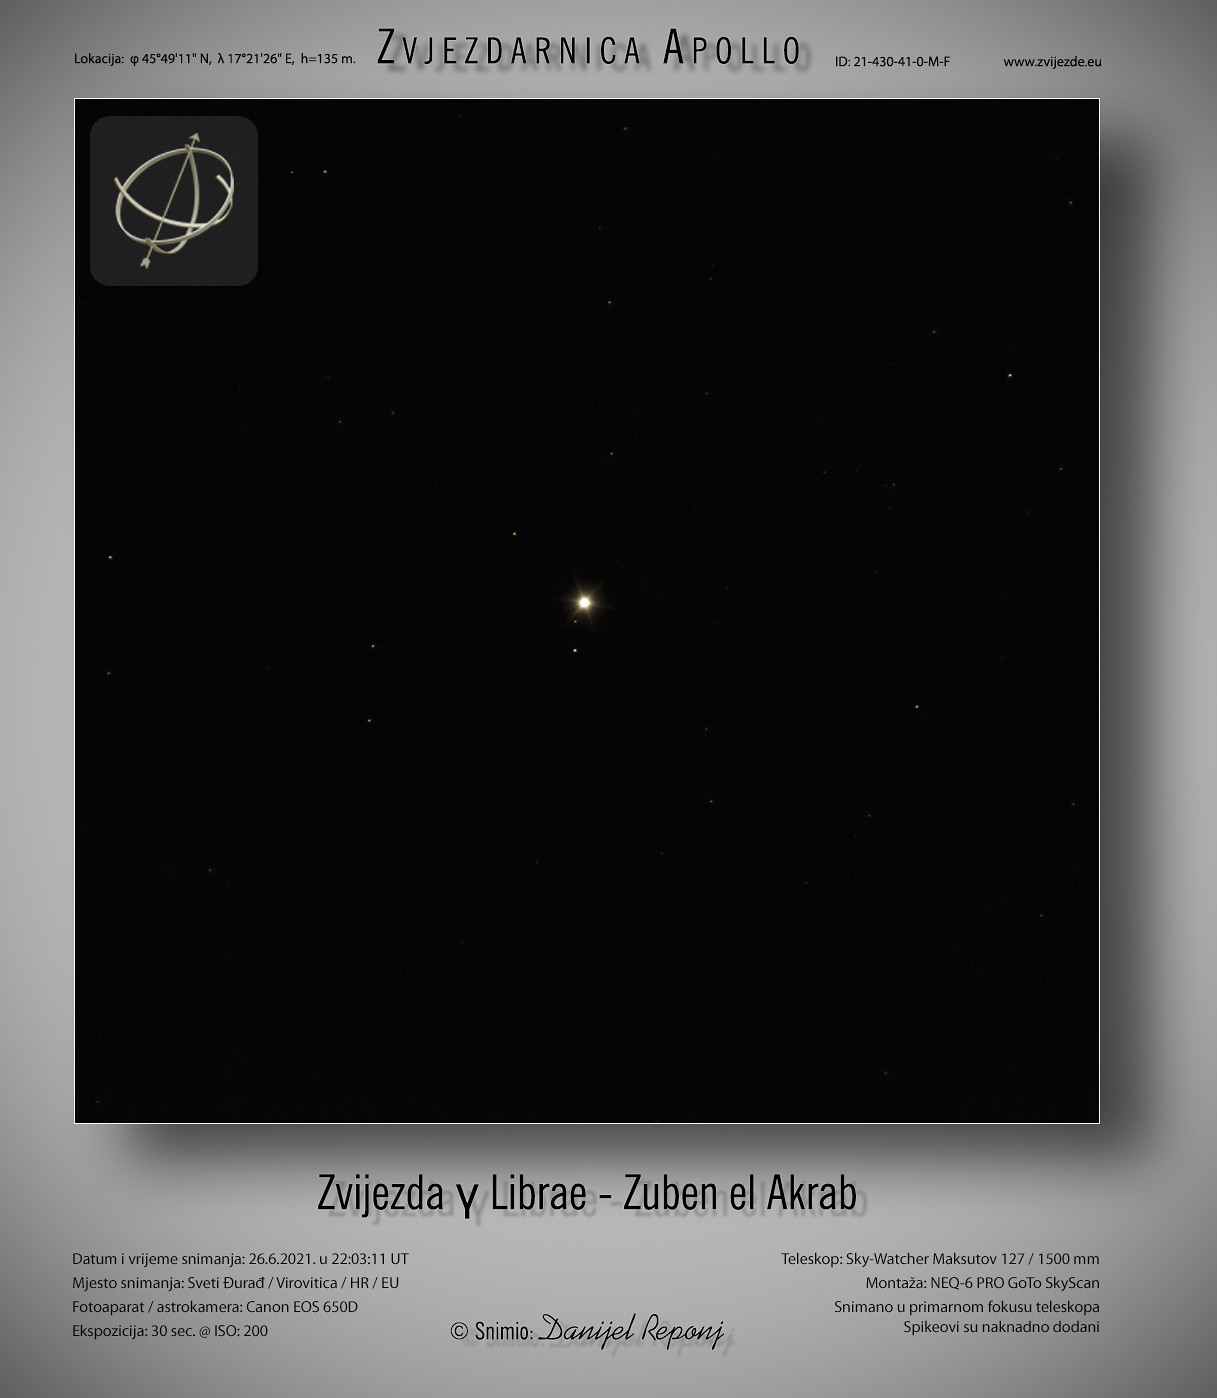 Zvijezda γ Librae - Zuben el Akrab, 26.6.2021.